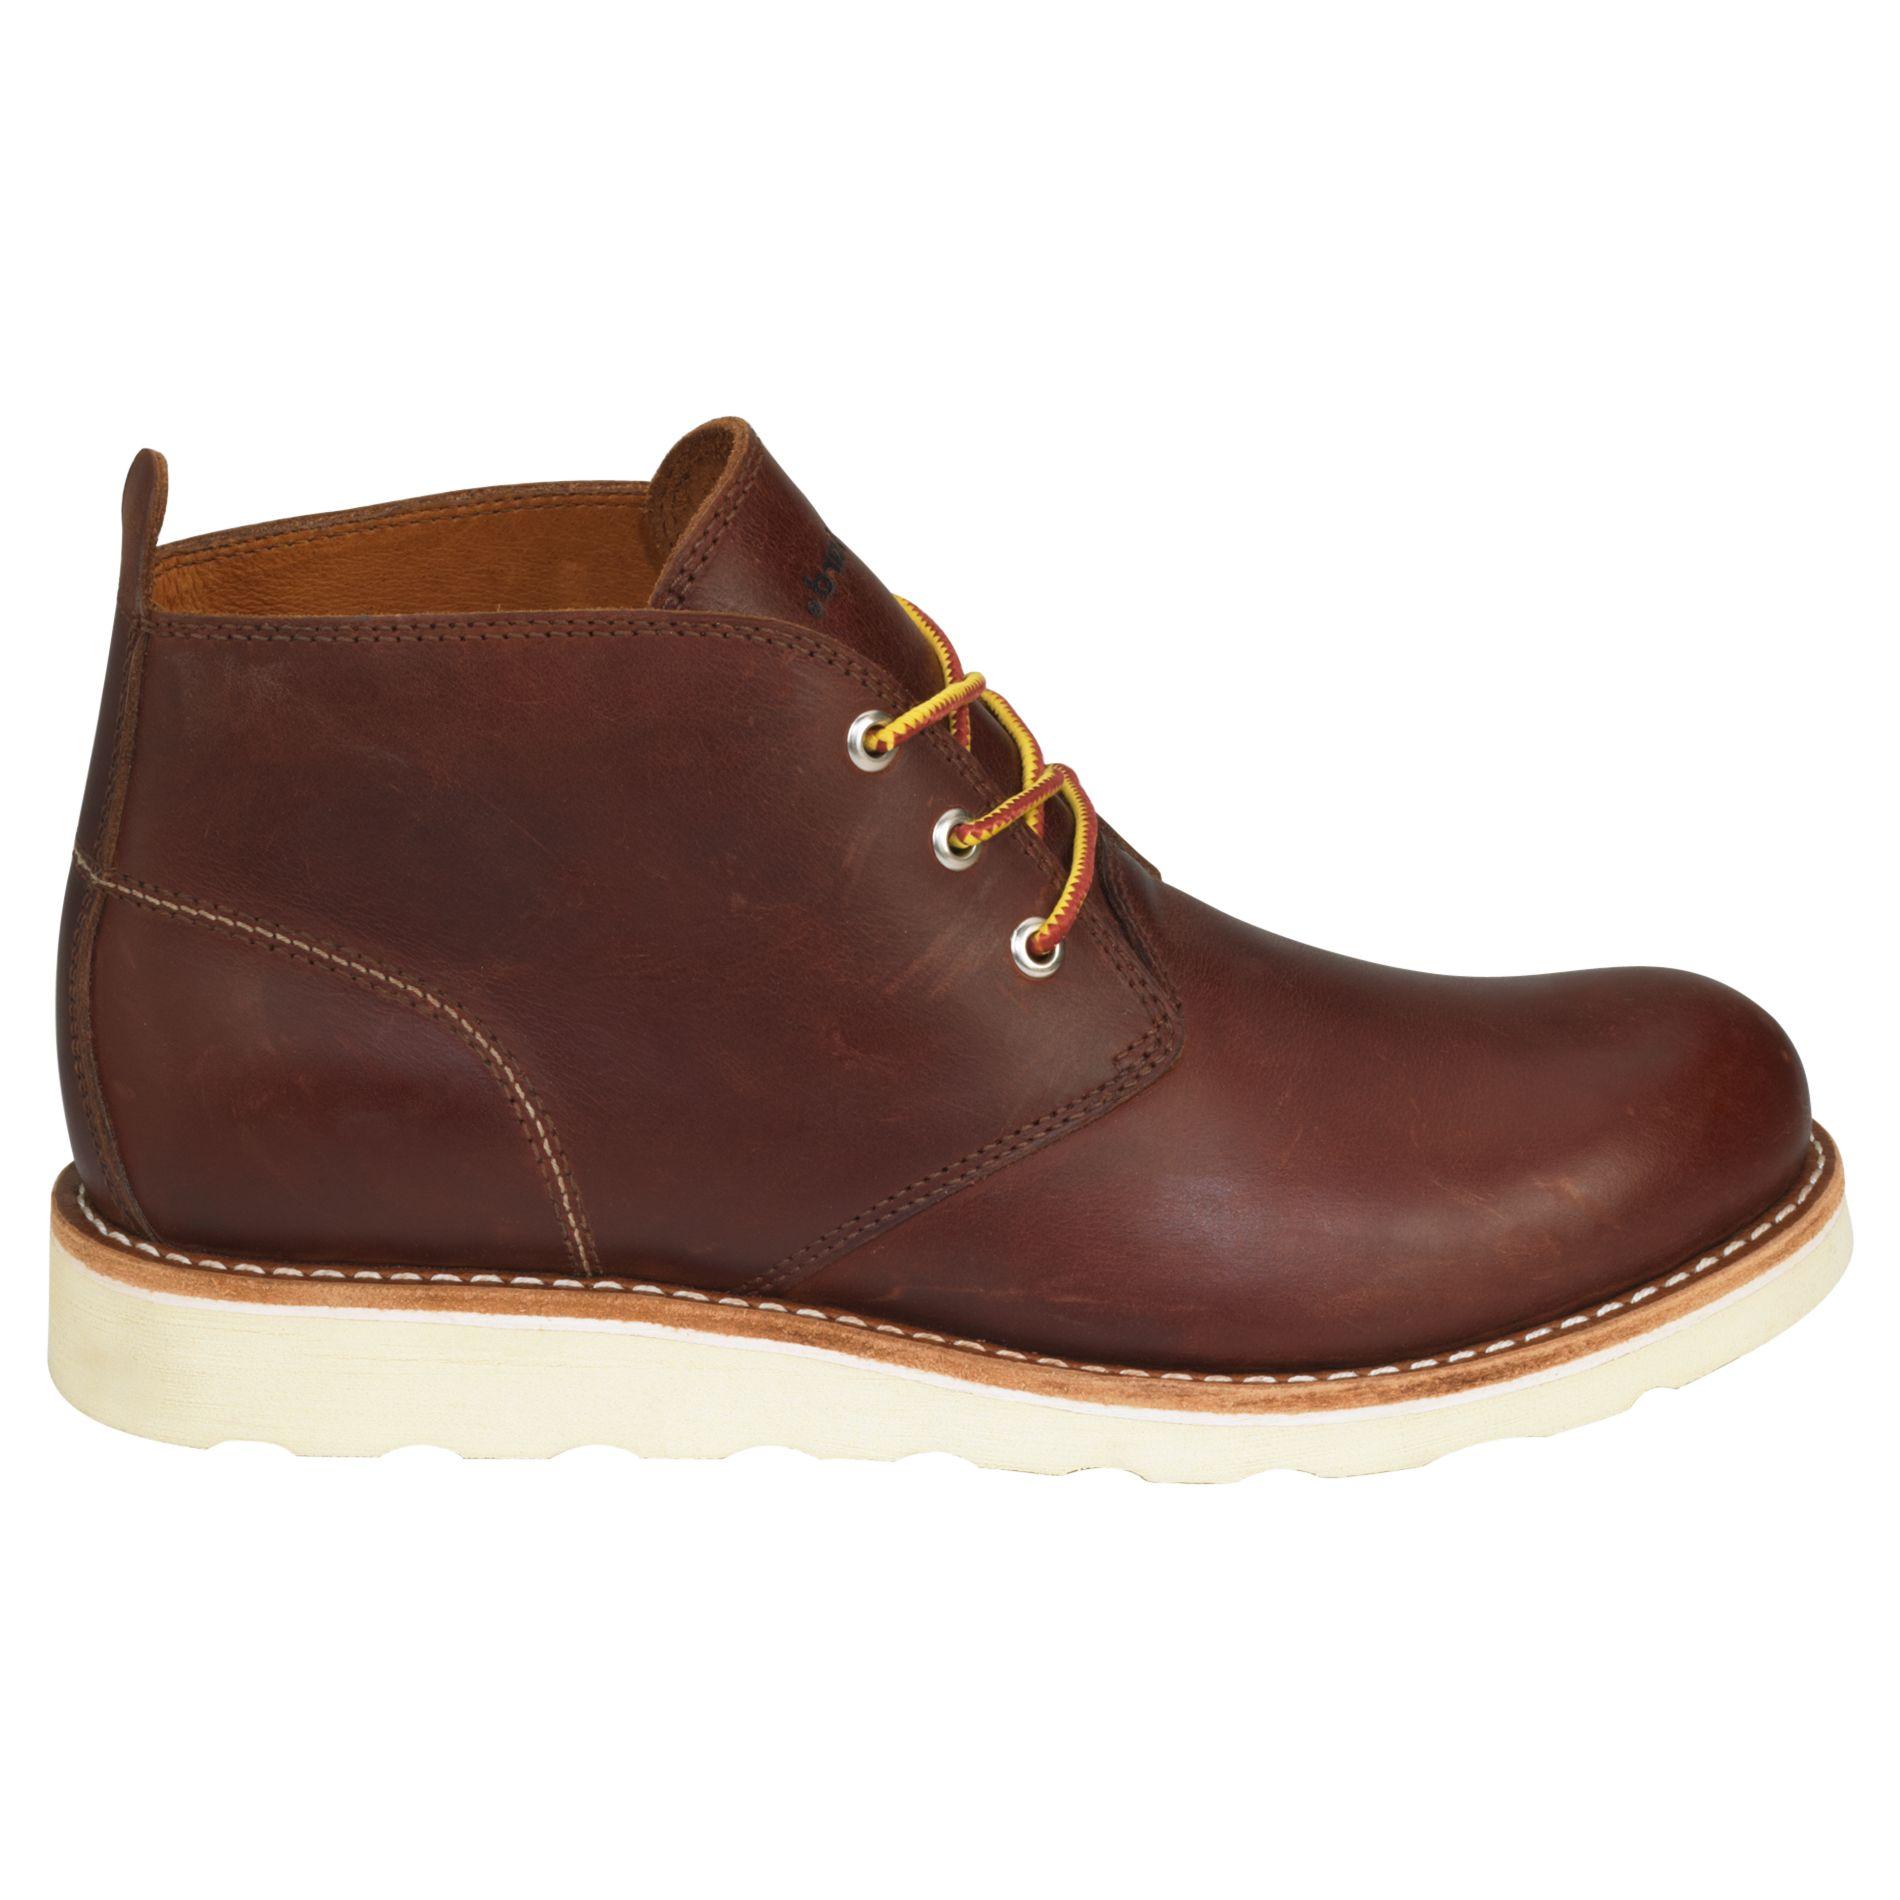 Diehard Chukka Mens Boots Get More Boot Choices At Sears